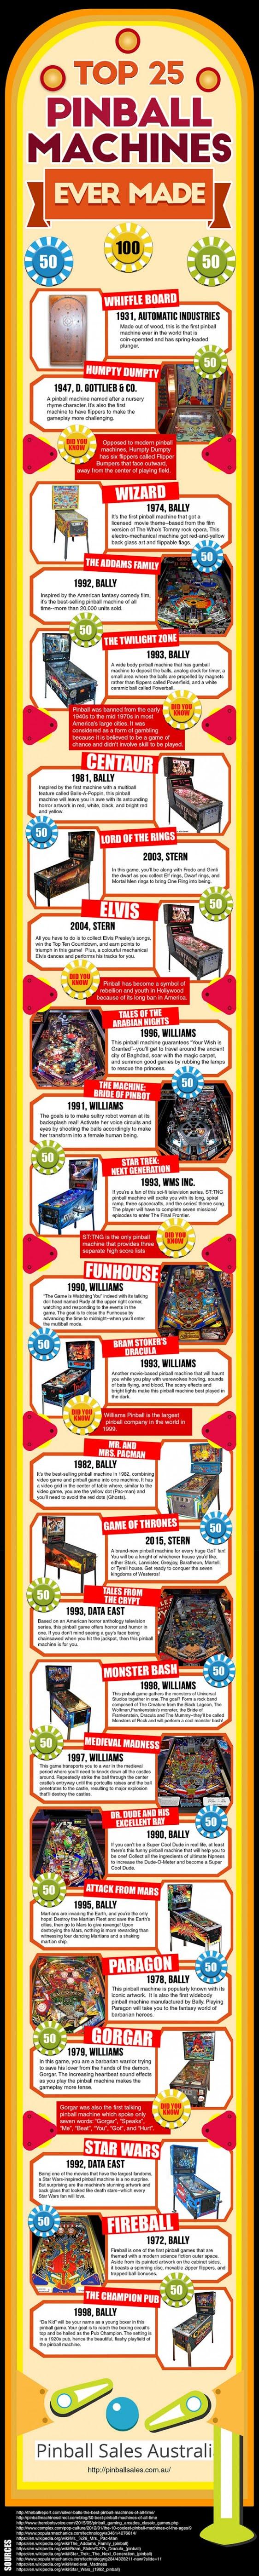 Top 25 Pinball Machine Ever Made #infographic